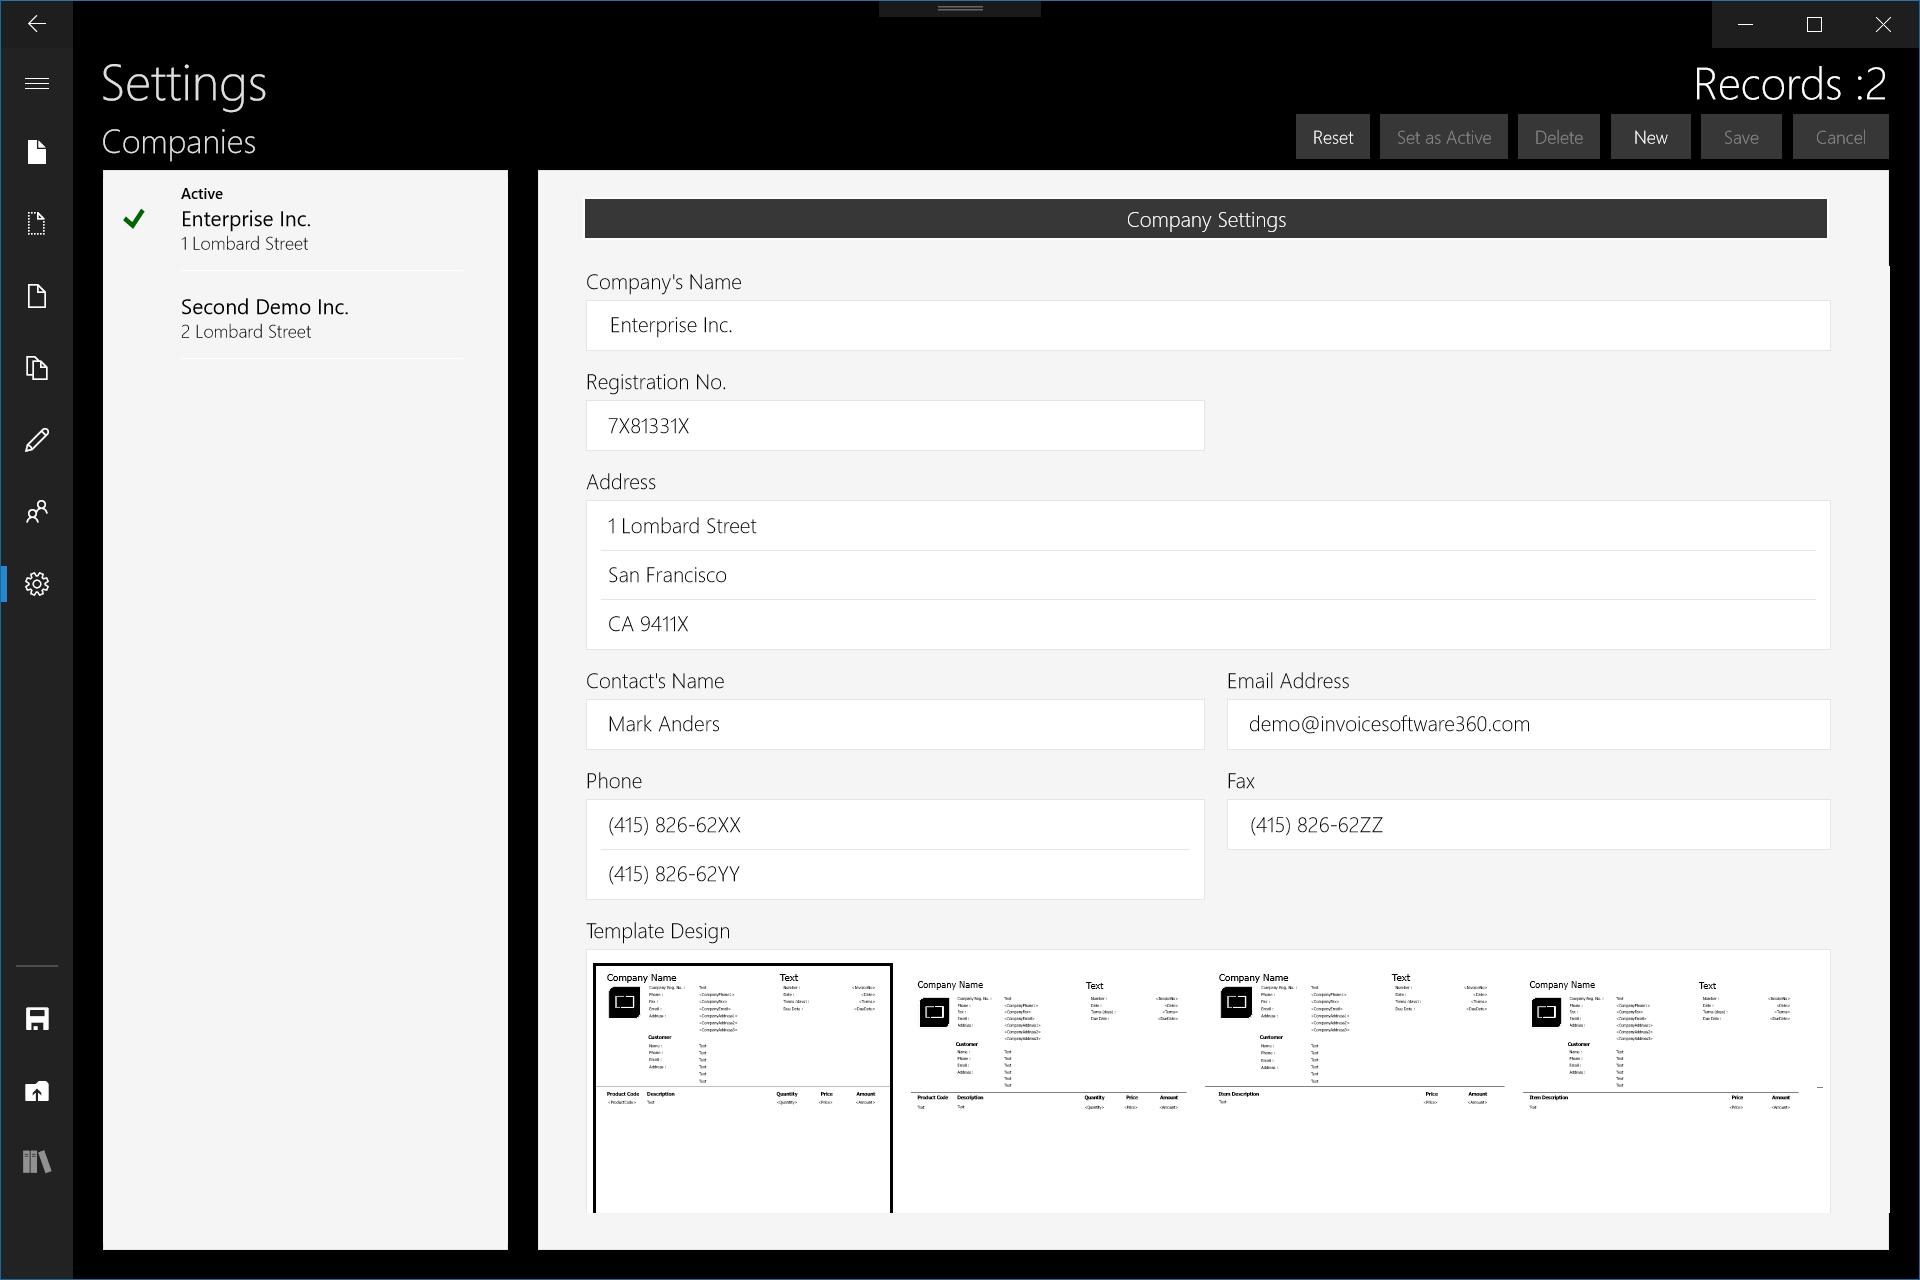 Setup Invoice - How to set up an invoice